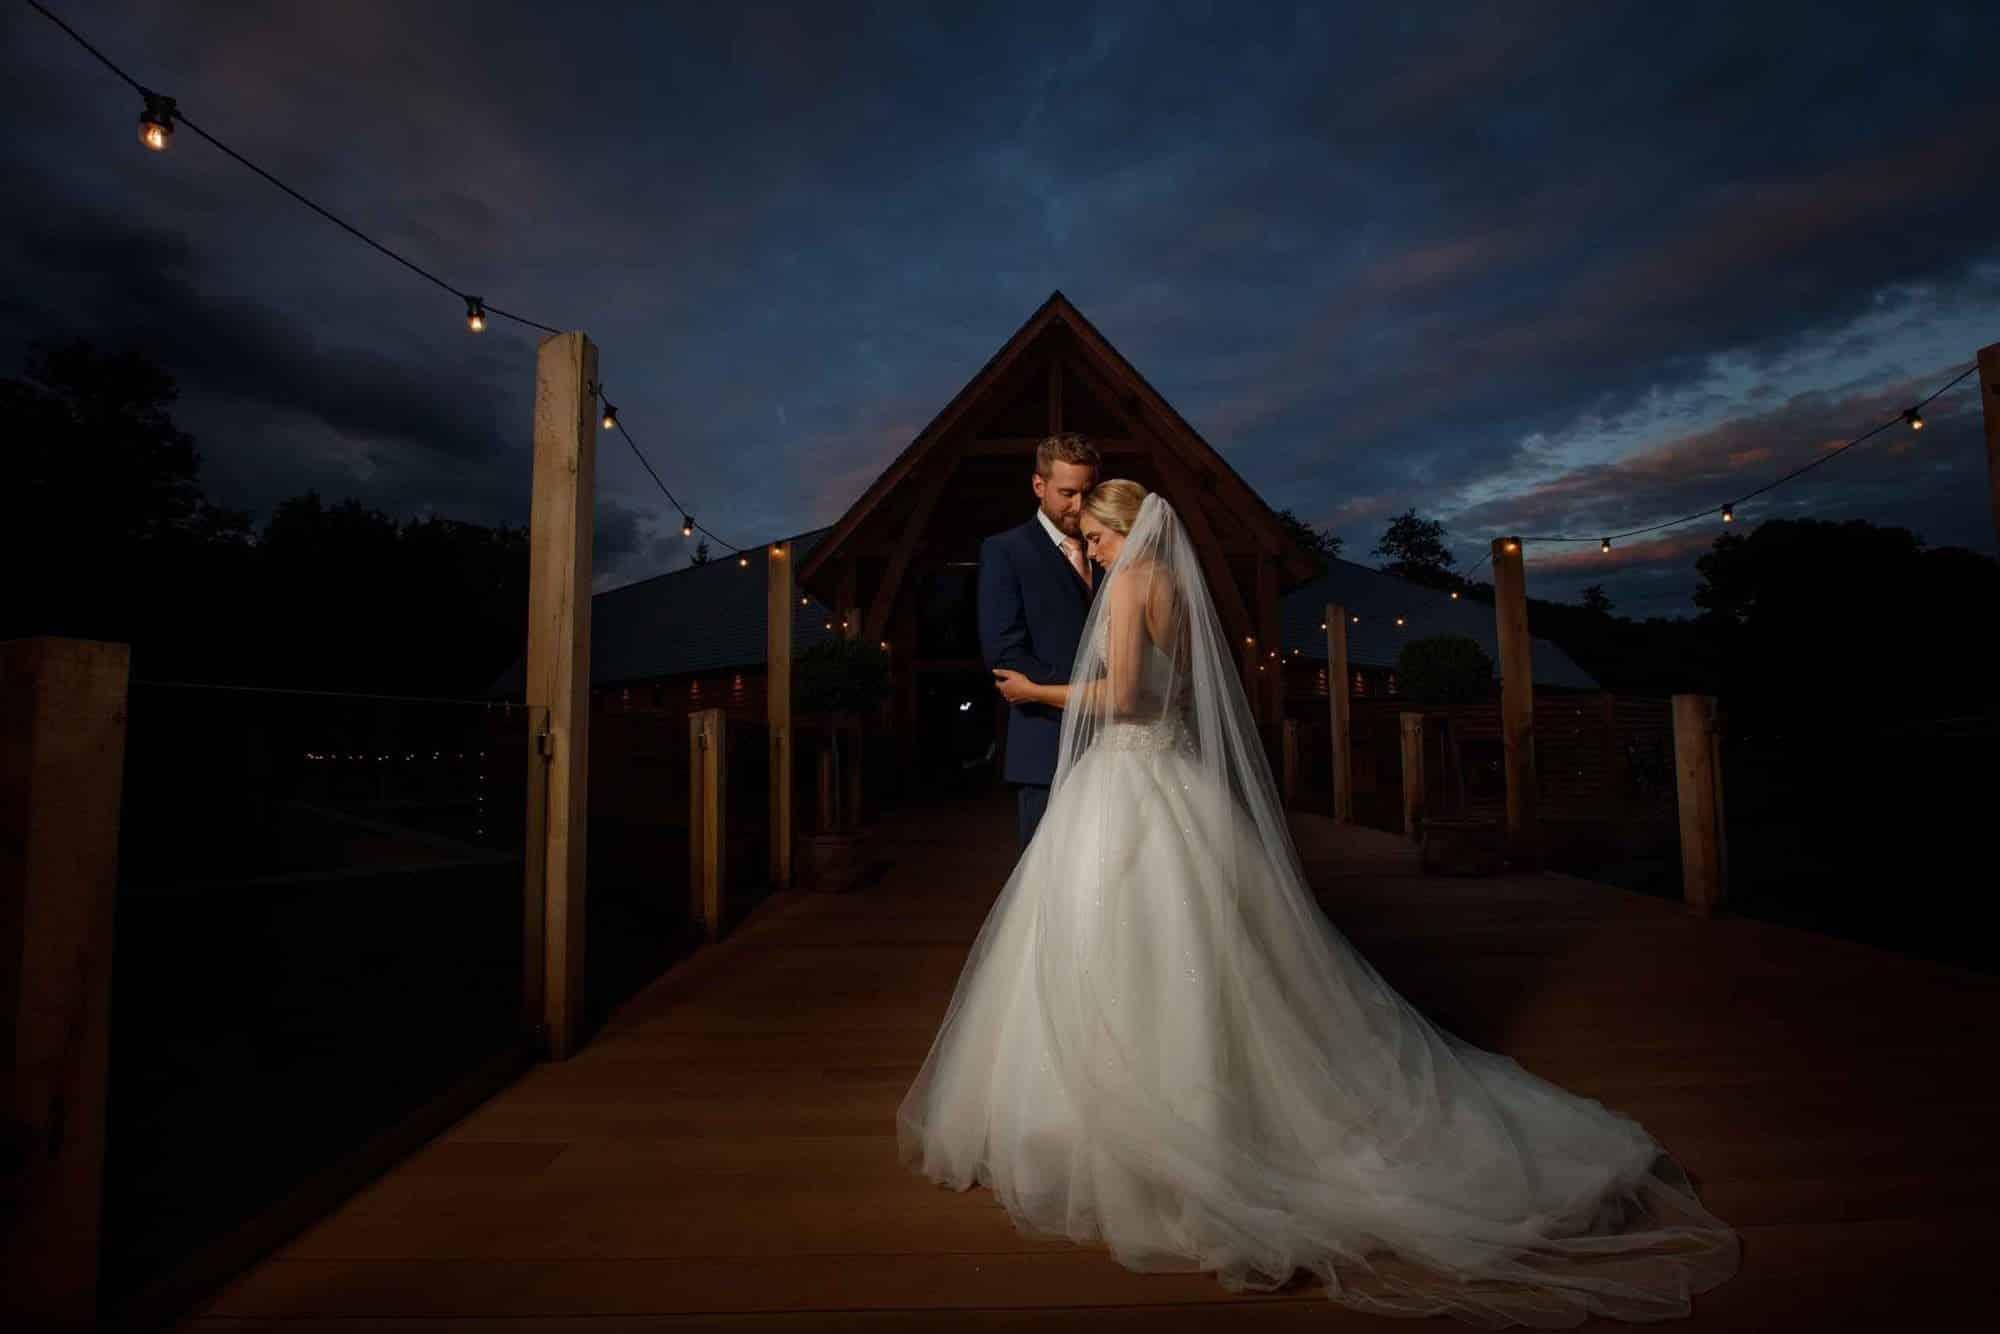 shropshire wedding photographer at Mill Barns